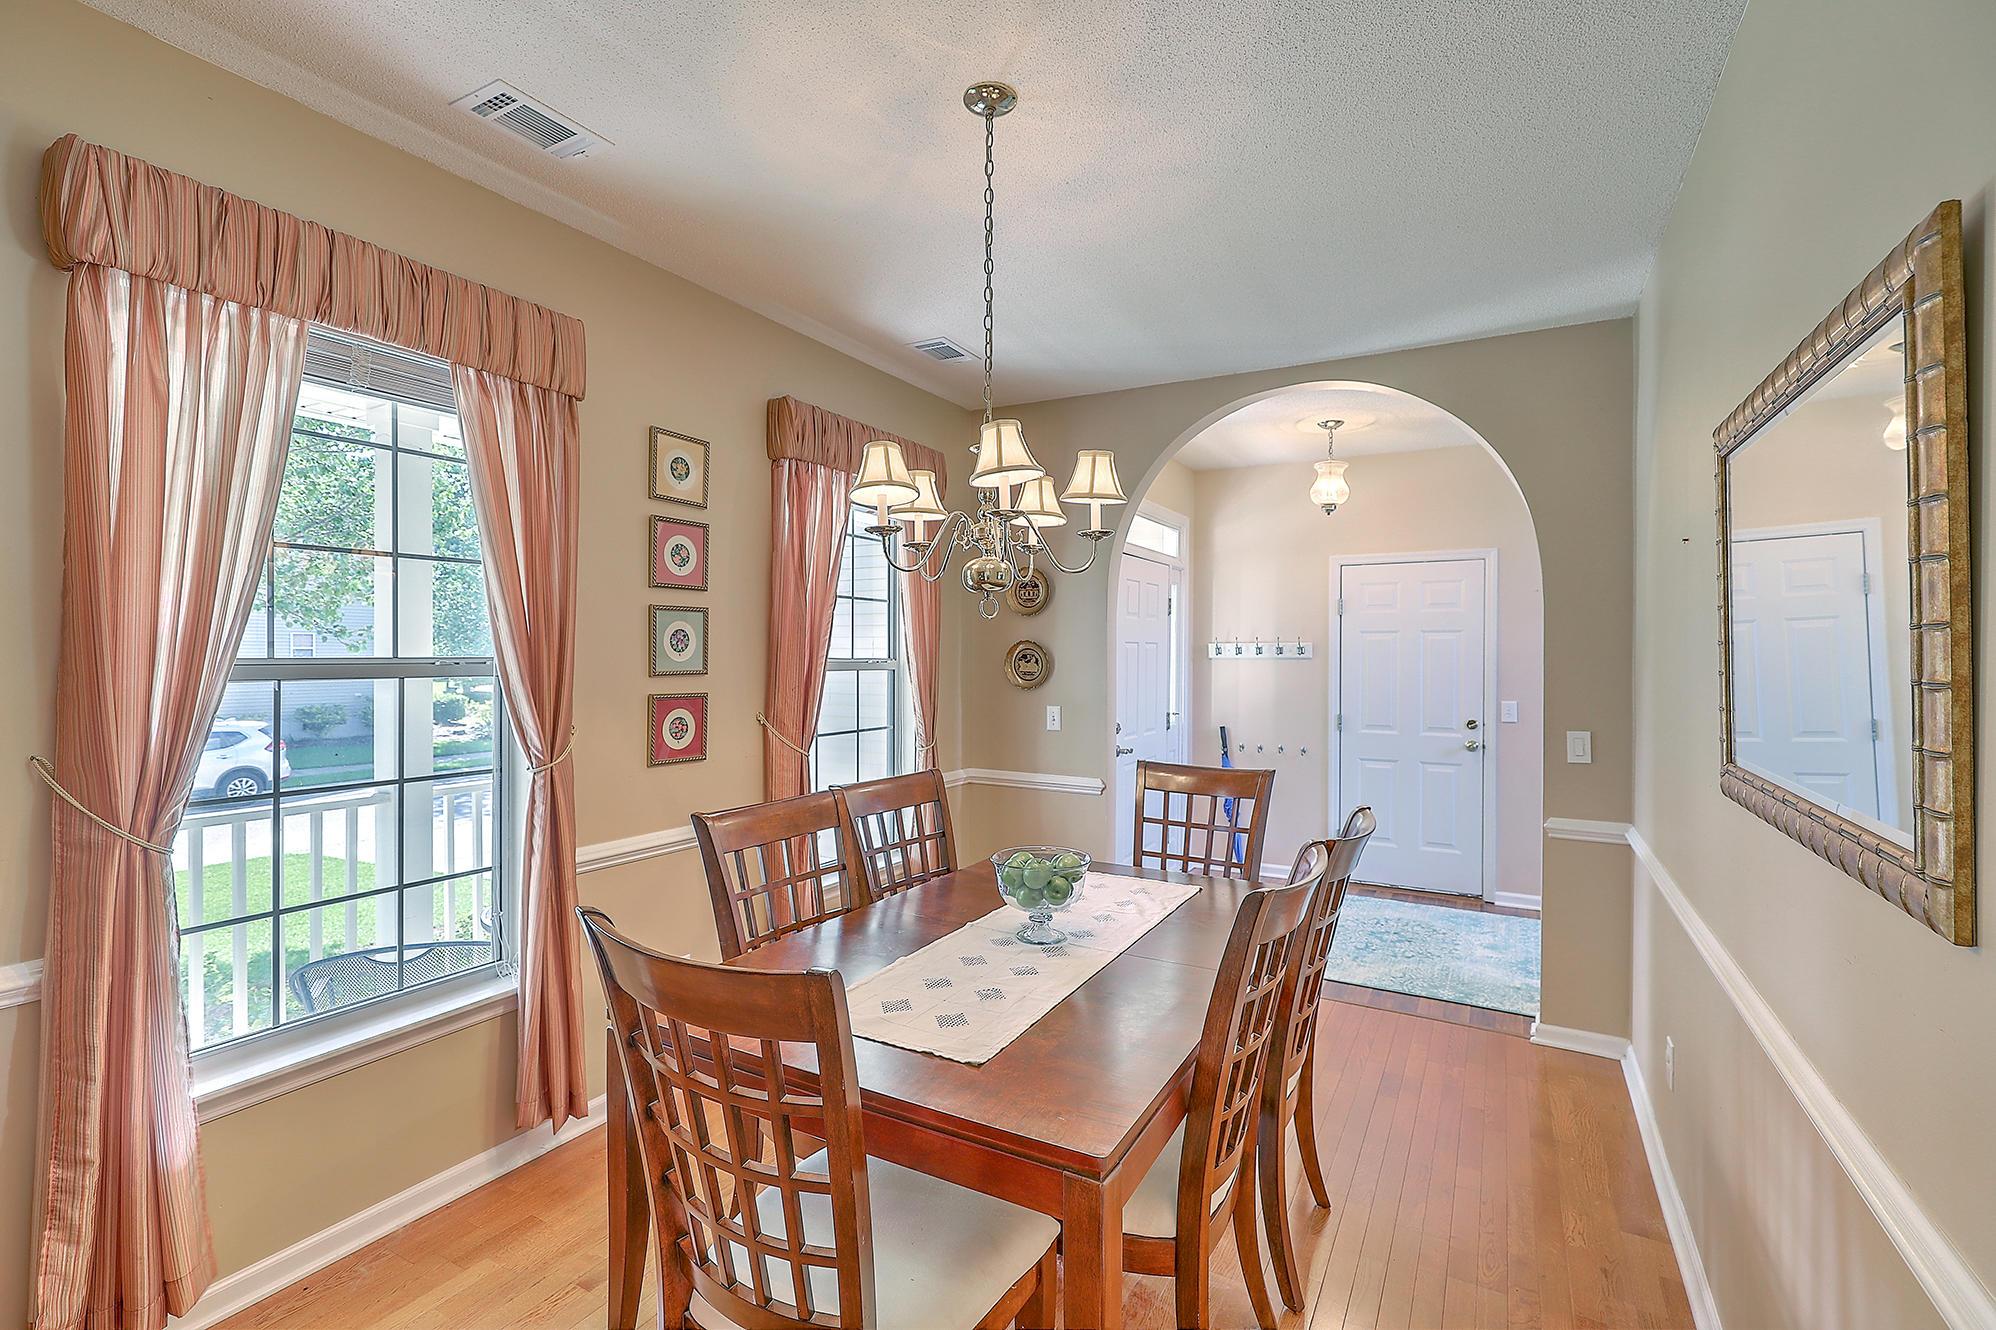 Belle Hall Homes For Sale - 106 Revolution, Mount Pleasant, SC - 45